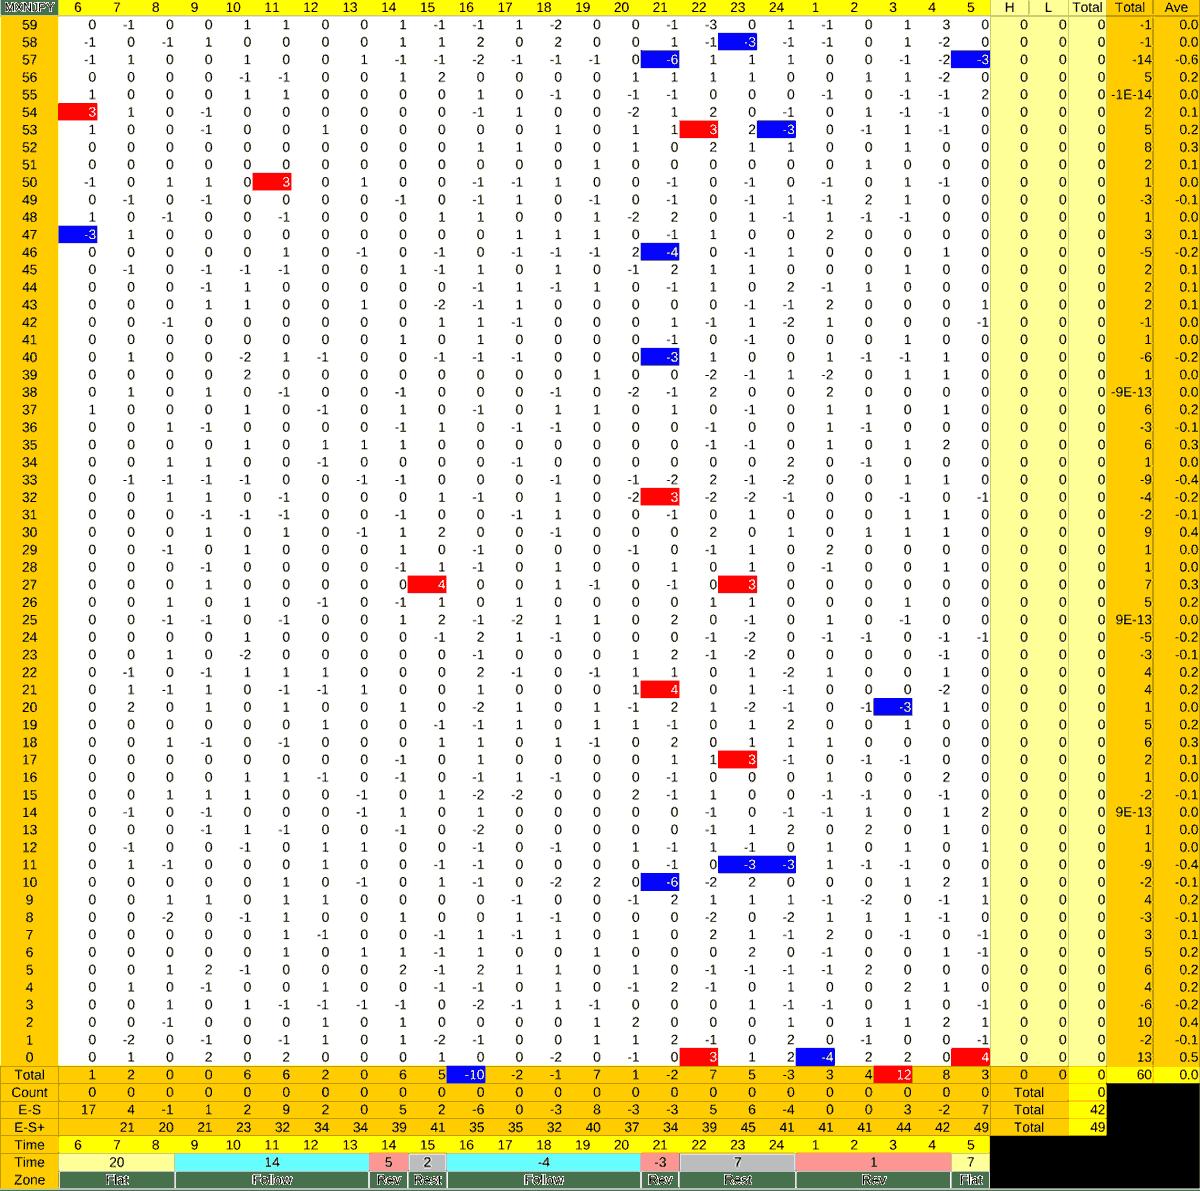 20210526_HS(3)MXNJPY